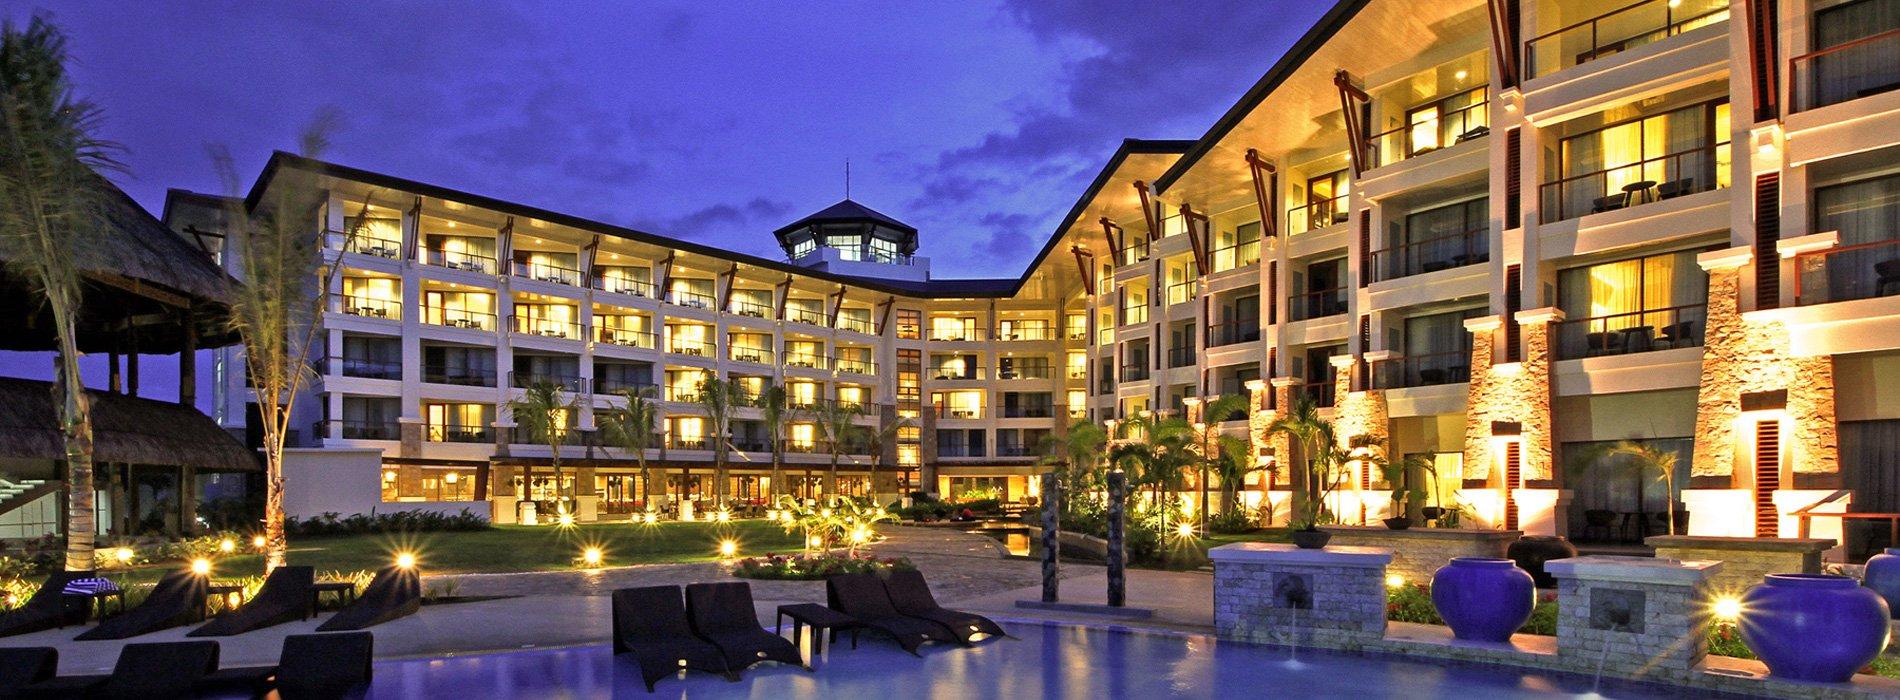 The Bellevue Bohol